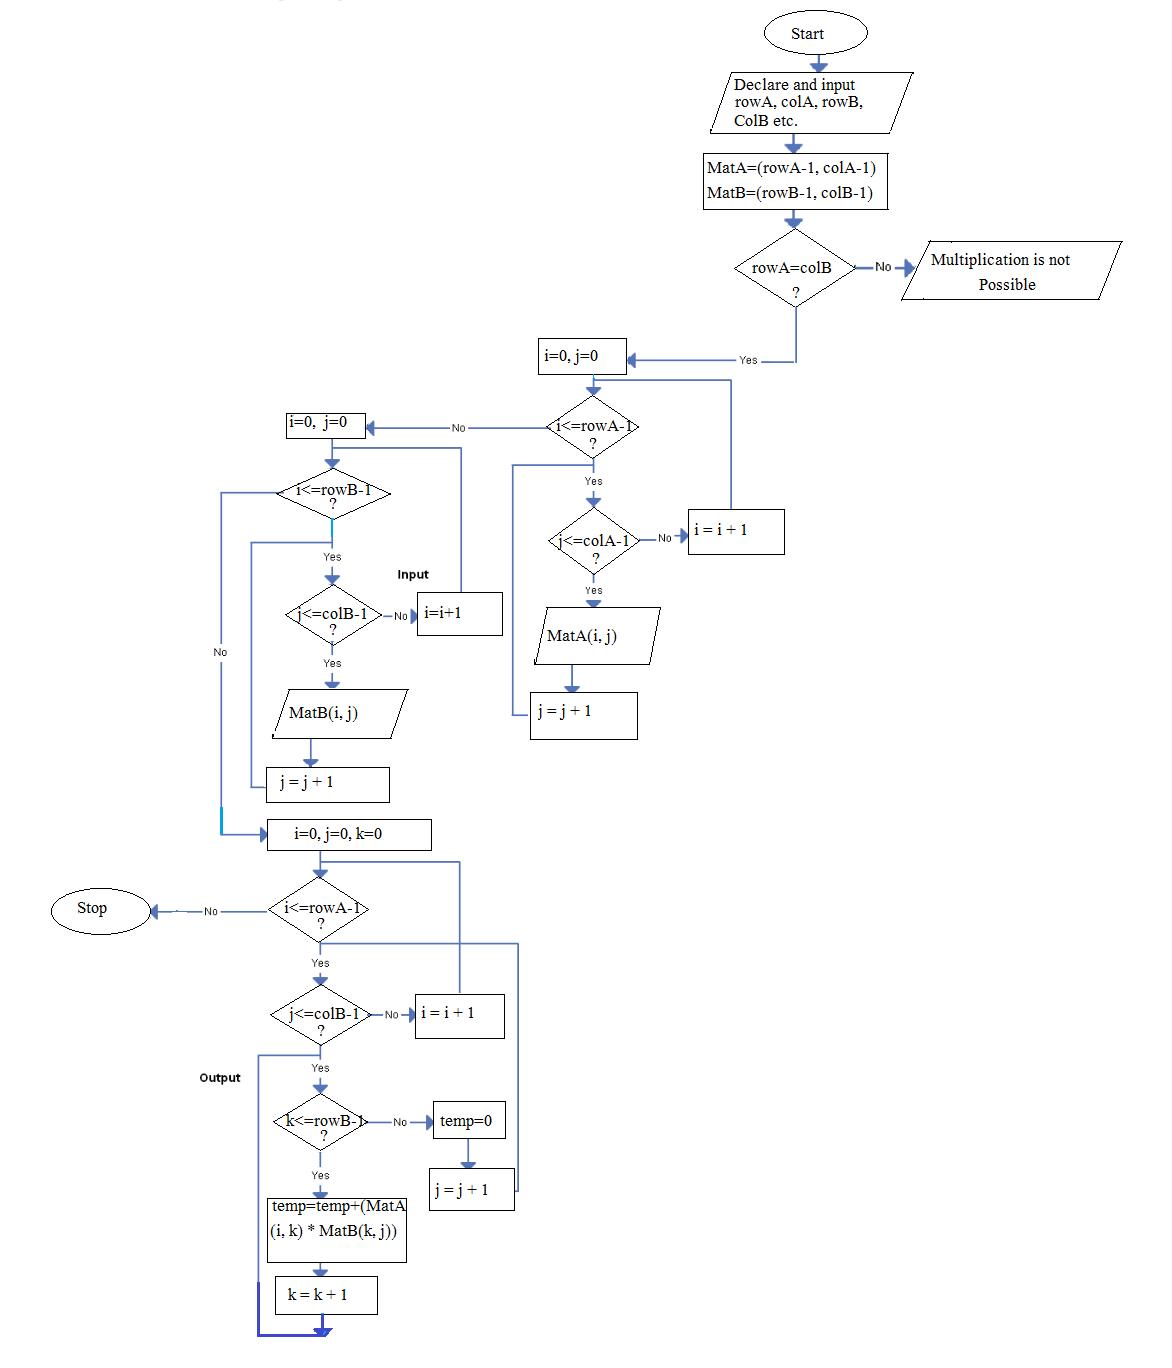 Matrix Multiplication Algorithm And Flowchart | Code With C